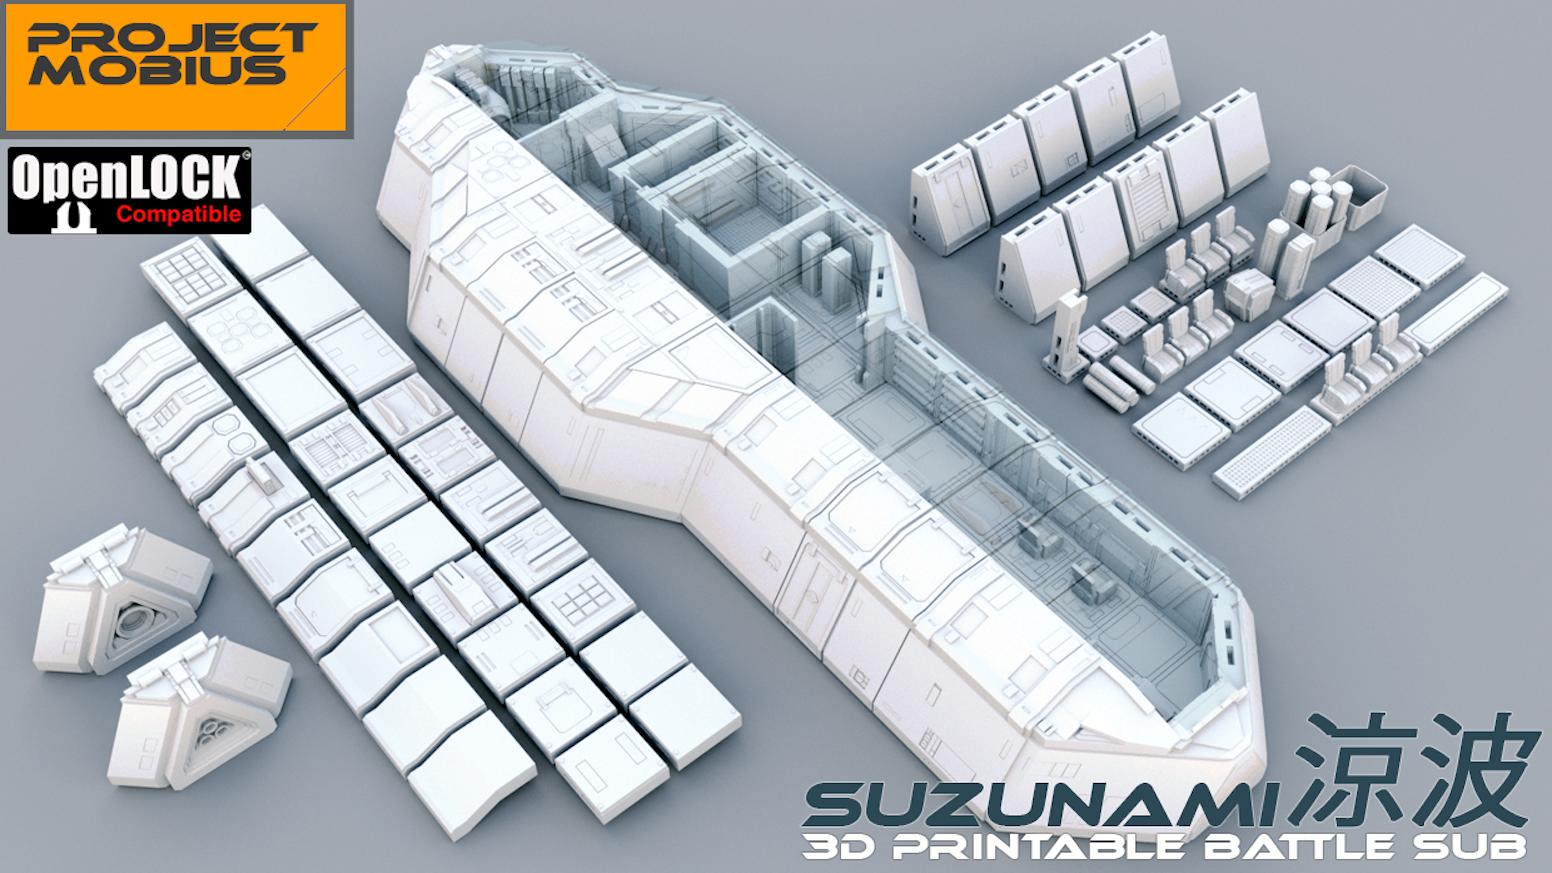 3D Printable OpenLOCK Compatible Tiles - Battle Sub Suzunami